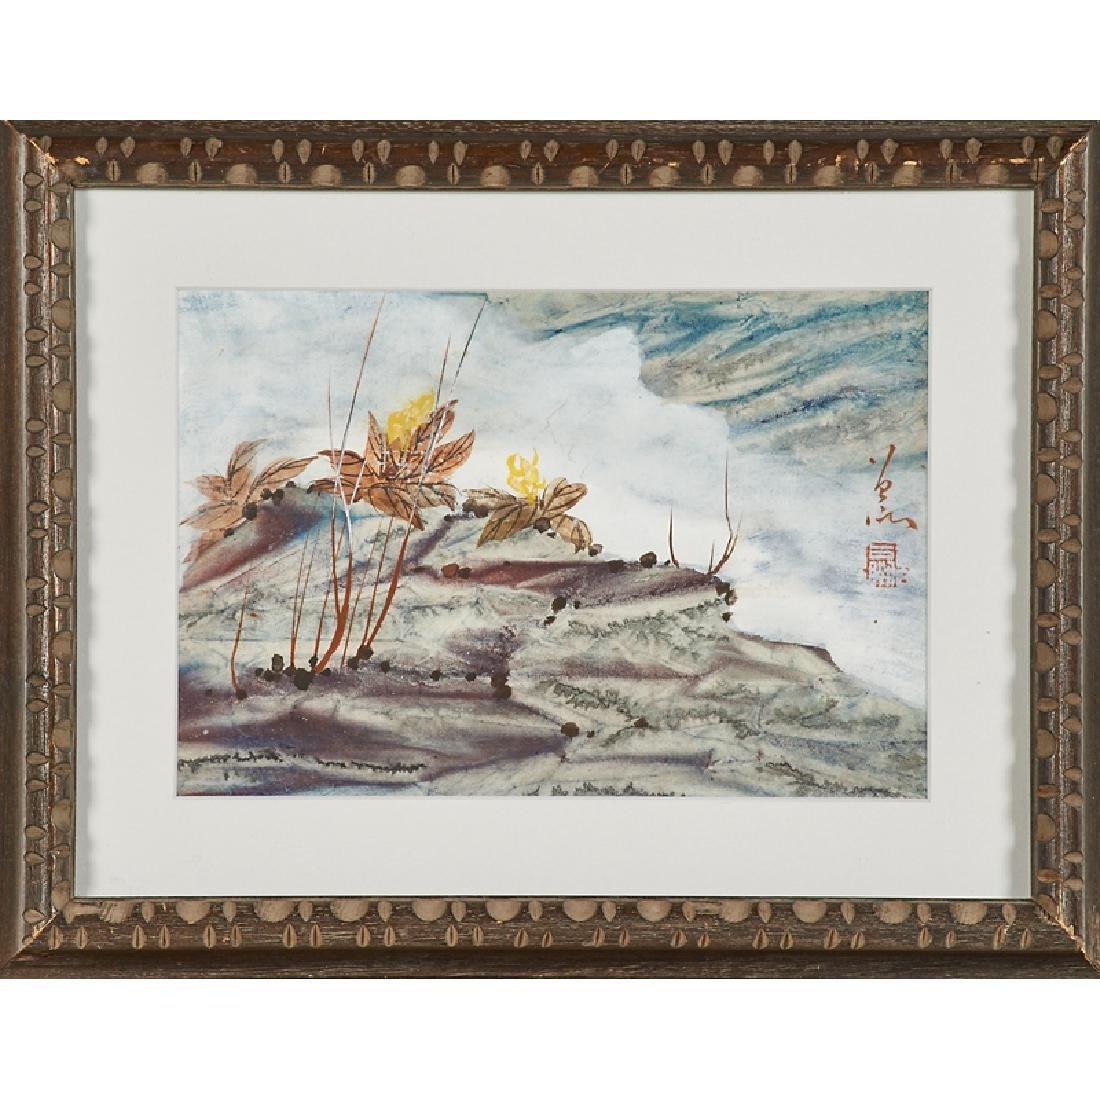 TSENG YING PANG (American/Chinese, 1916-1997)